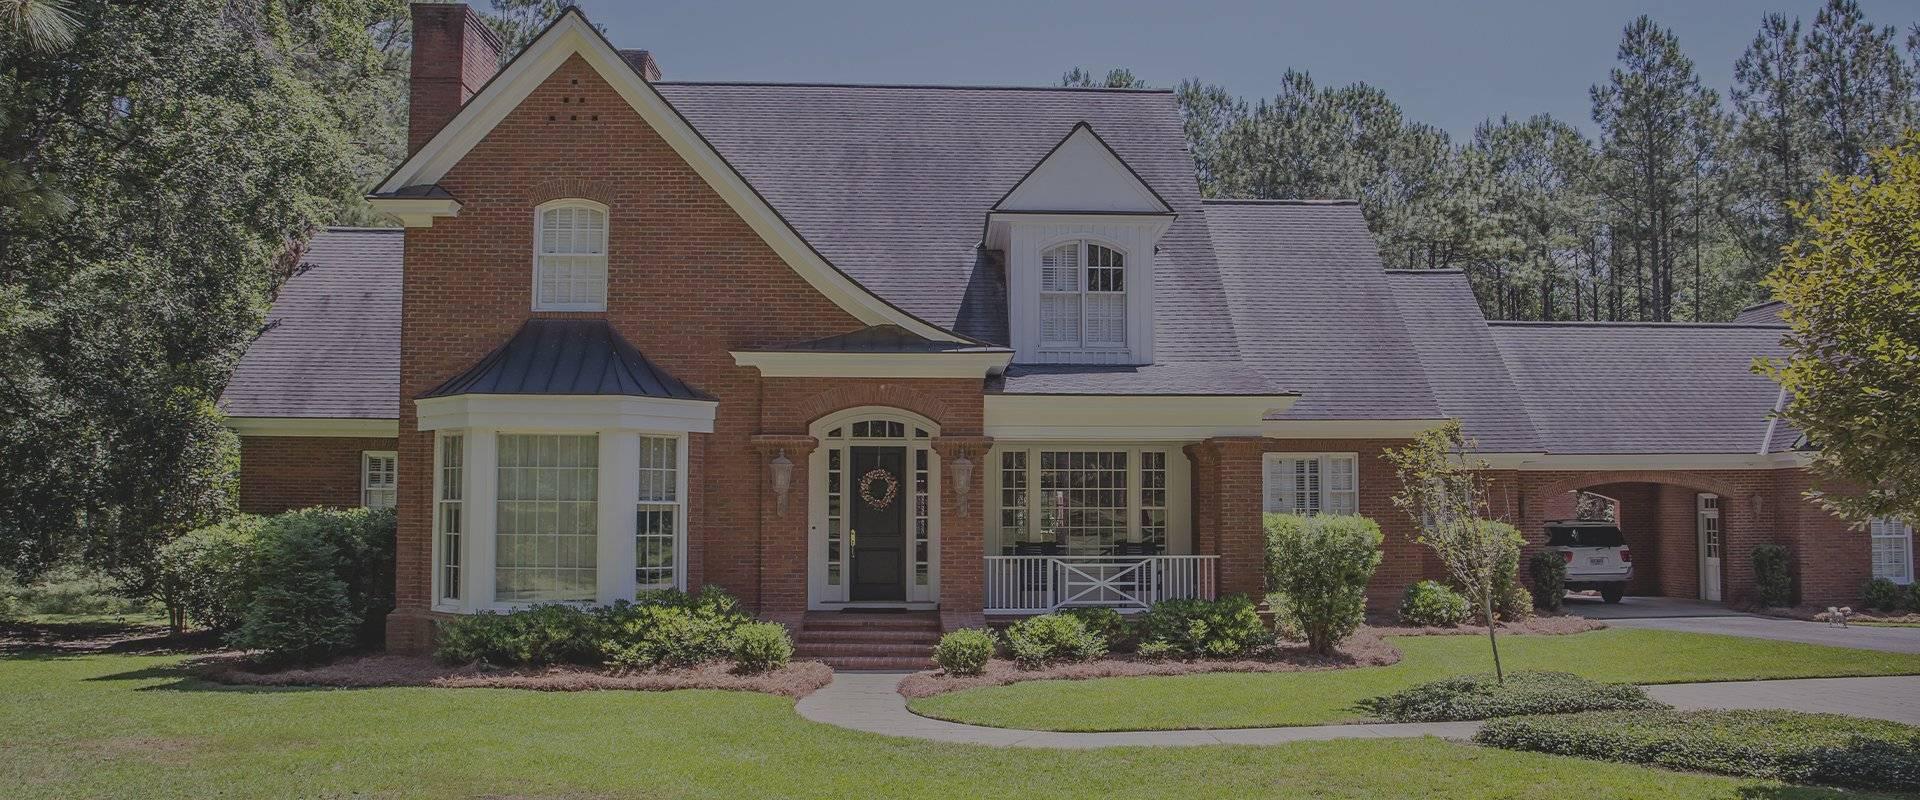 nice home with paved driveway